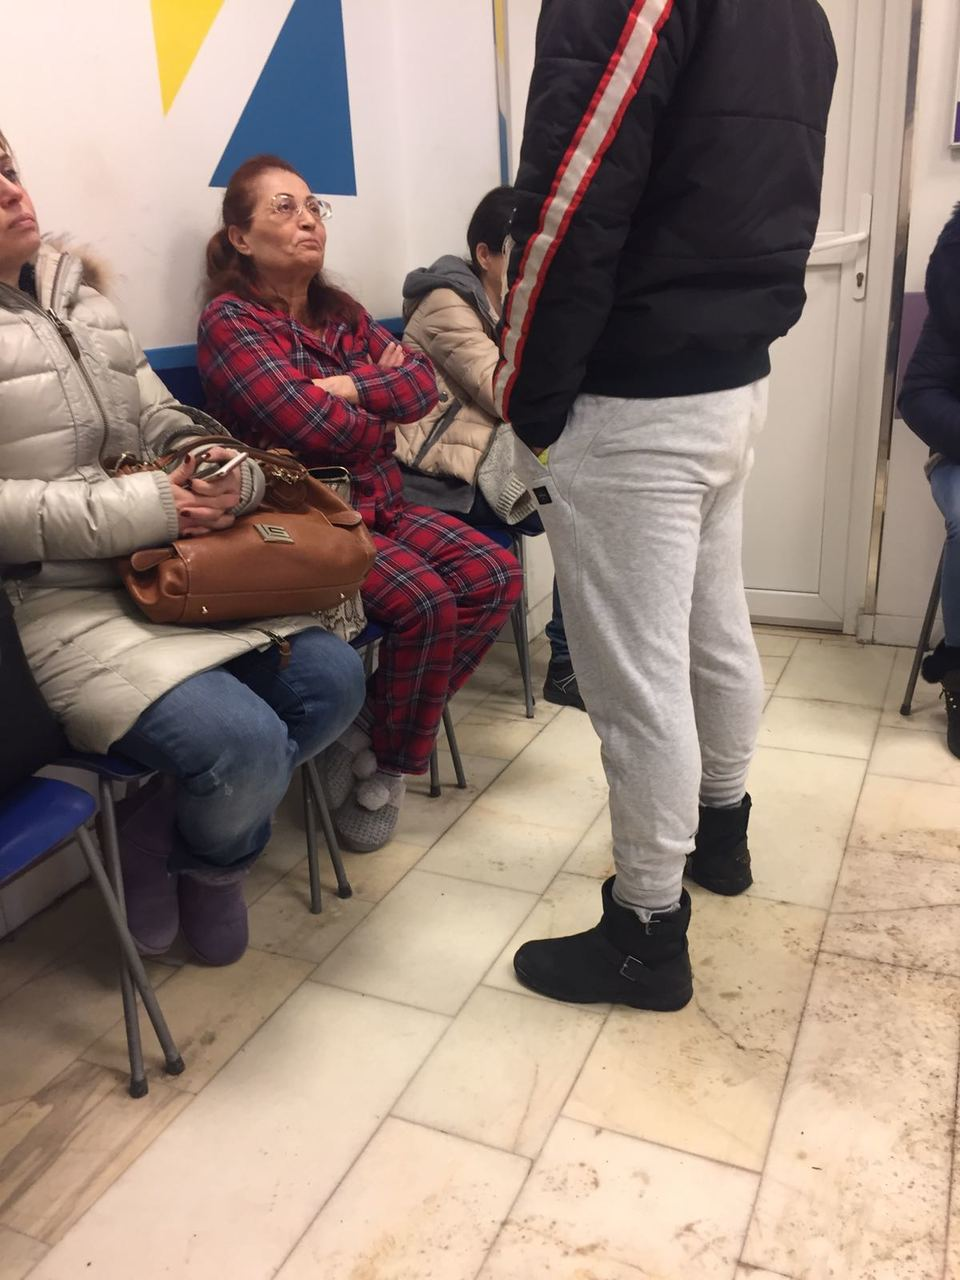 Momente delicate pentru Pepe si familia sa! Mama artistului a ajuns la spital dupa ce s-a simtit rau! VIDEO EXCLUSIV